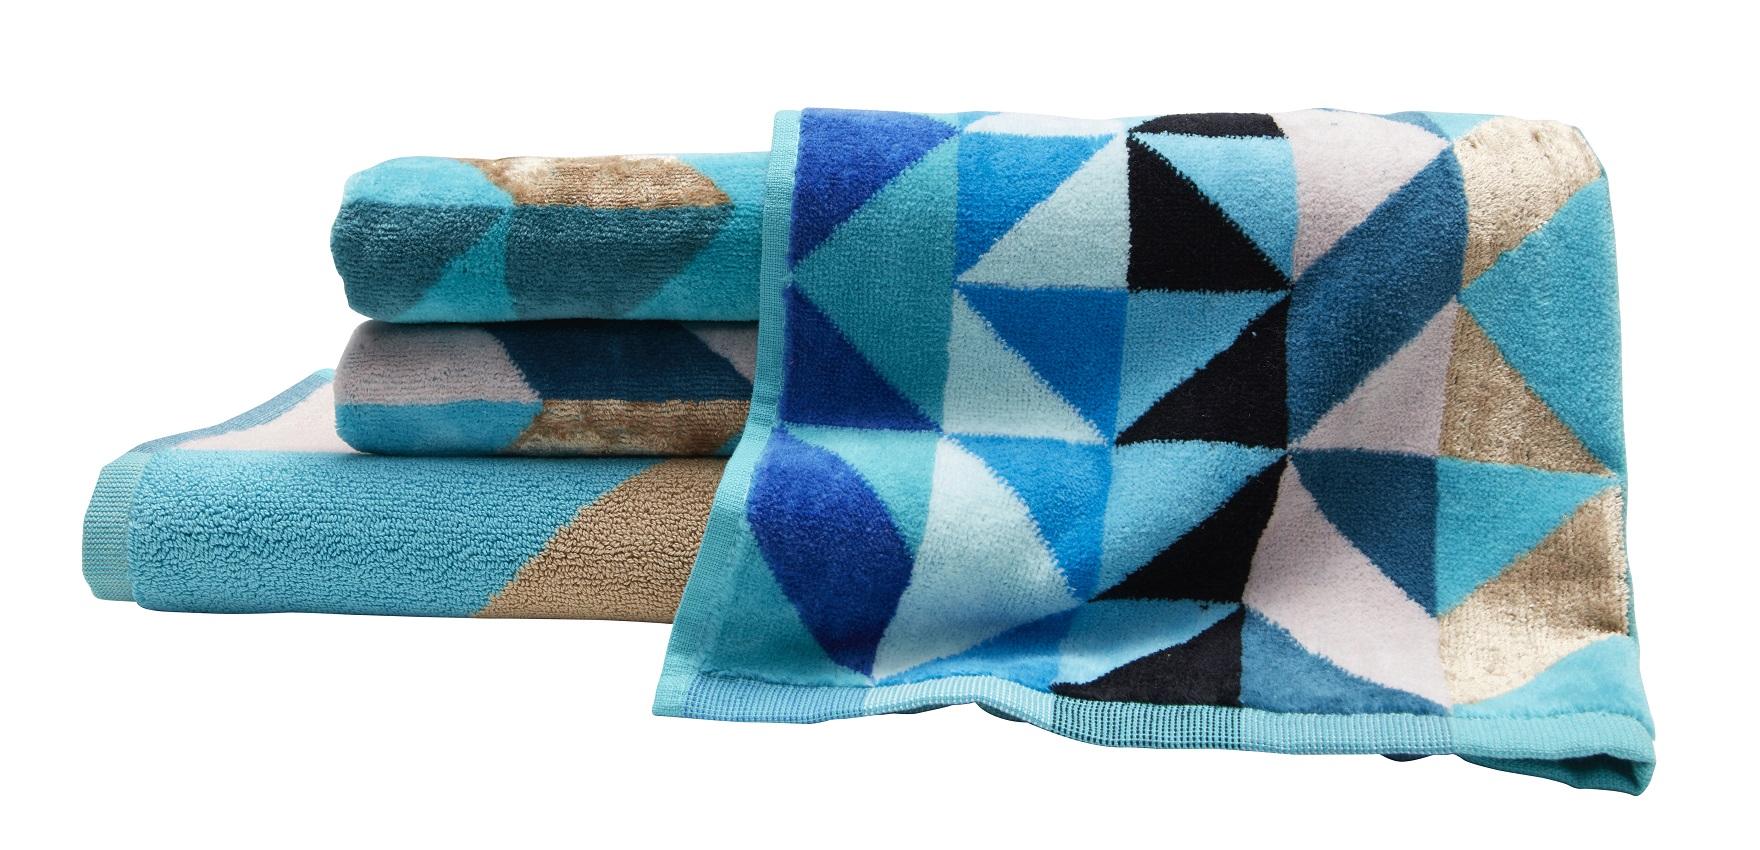 Ninnho peacock bath towel set designs to inspire